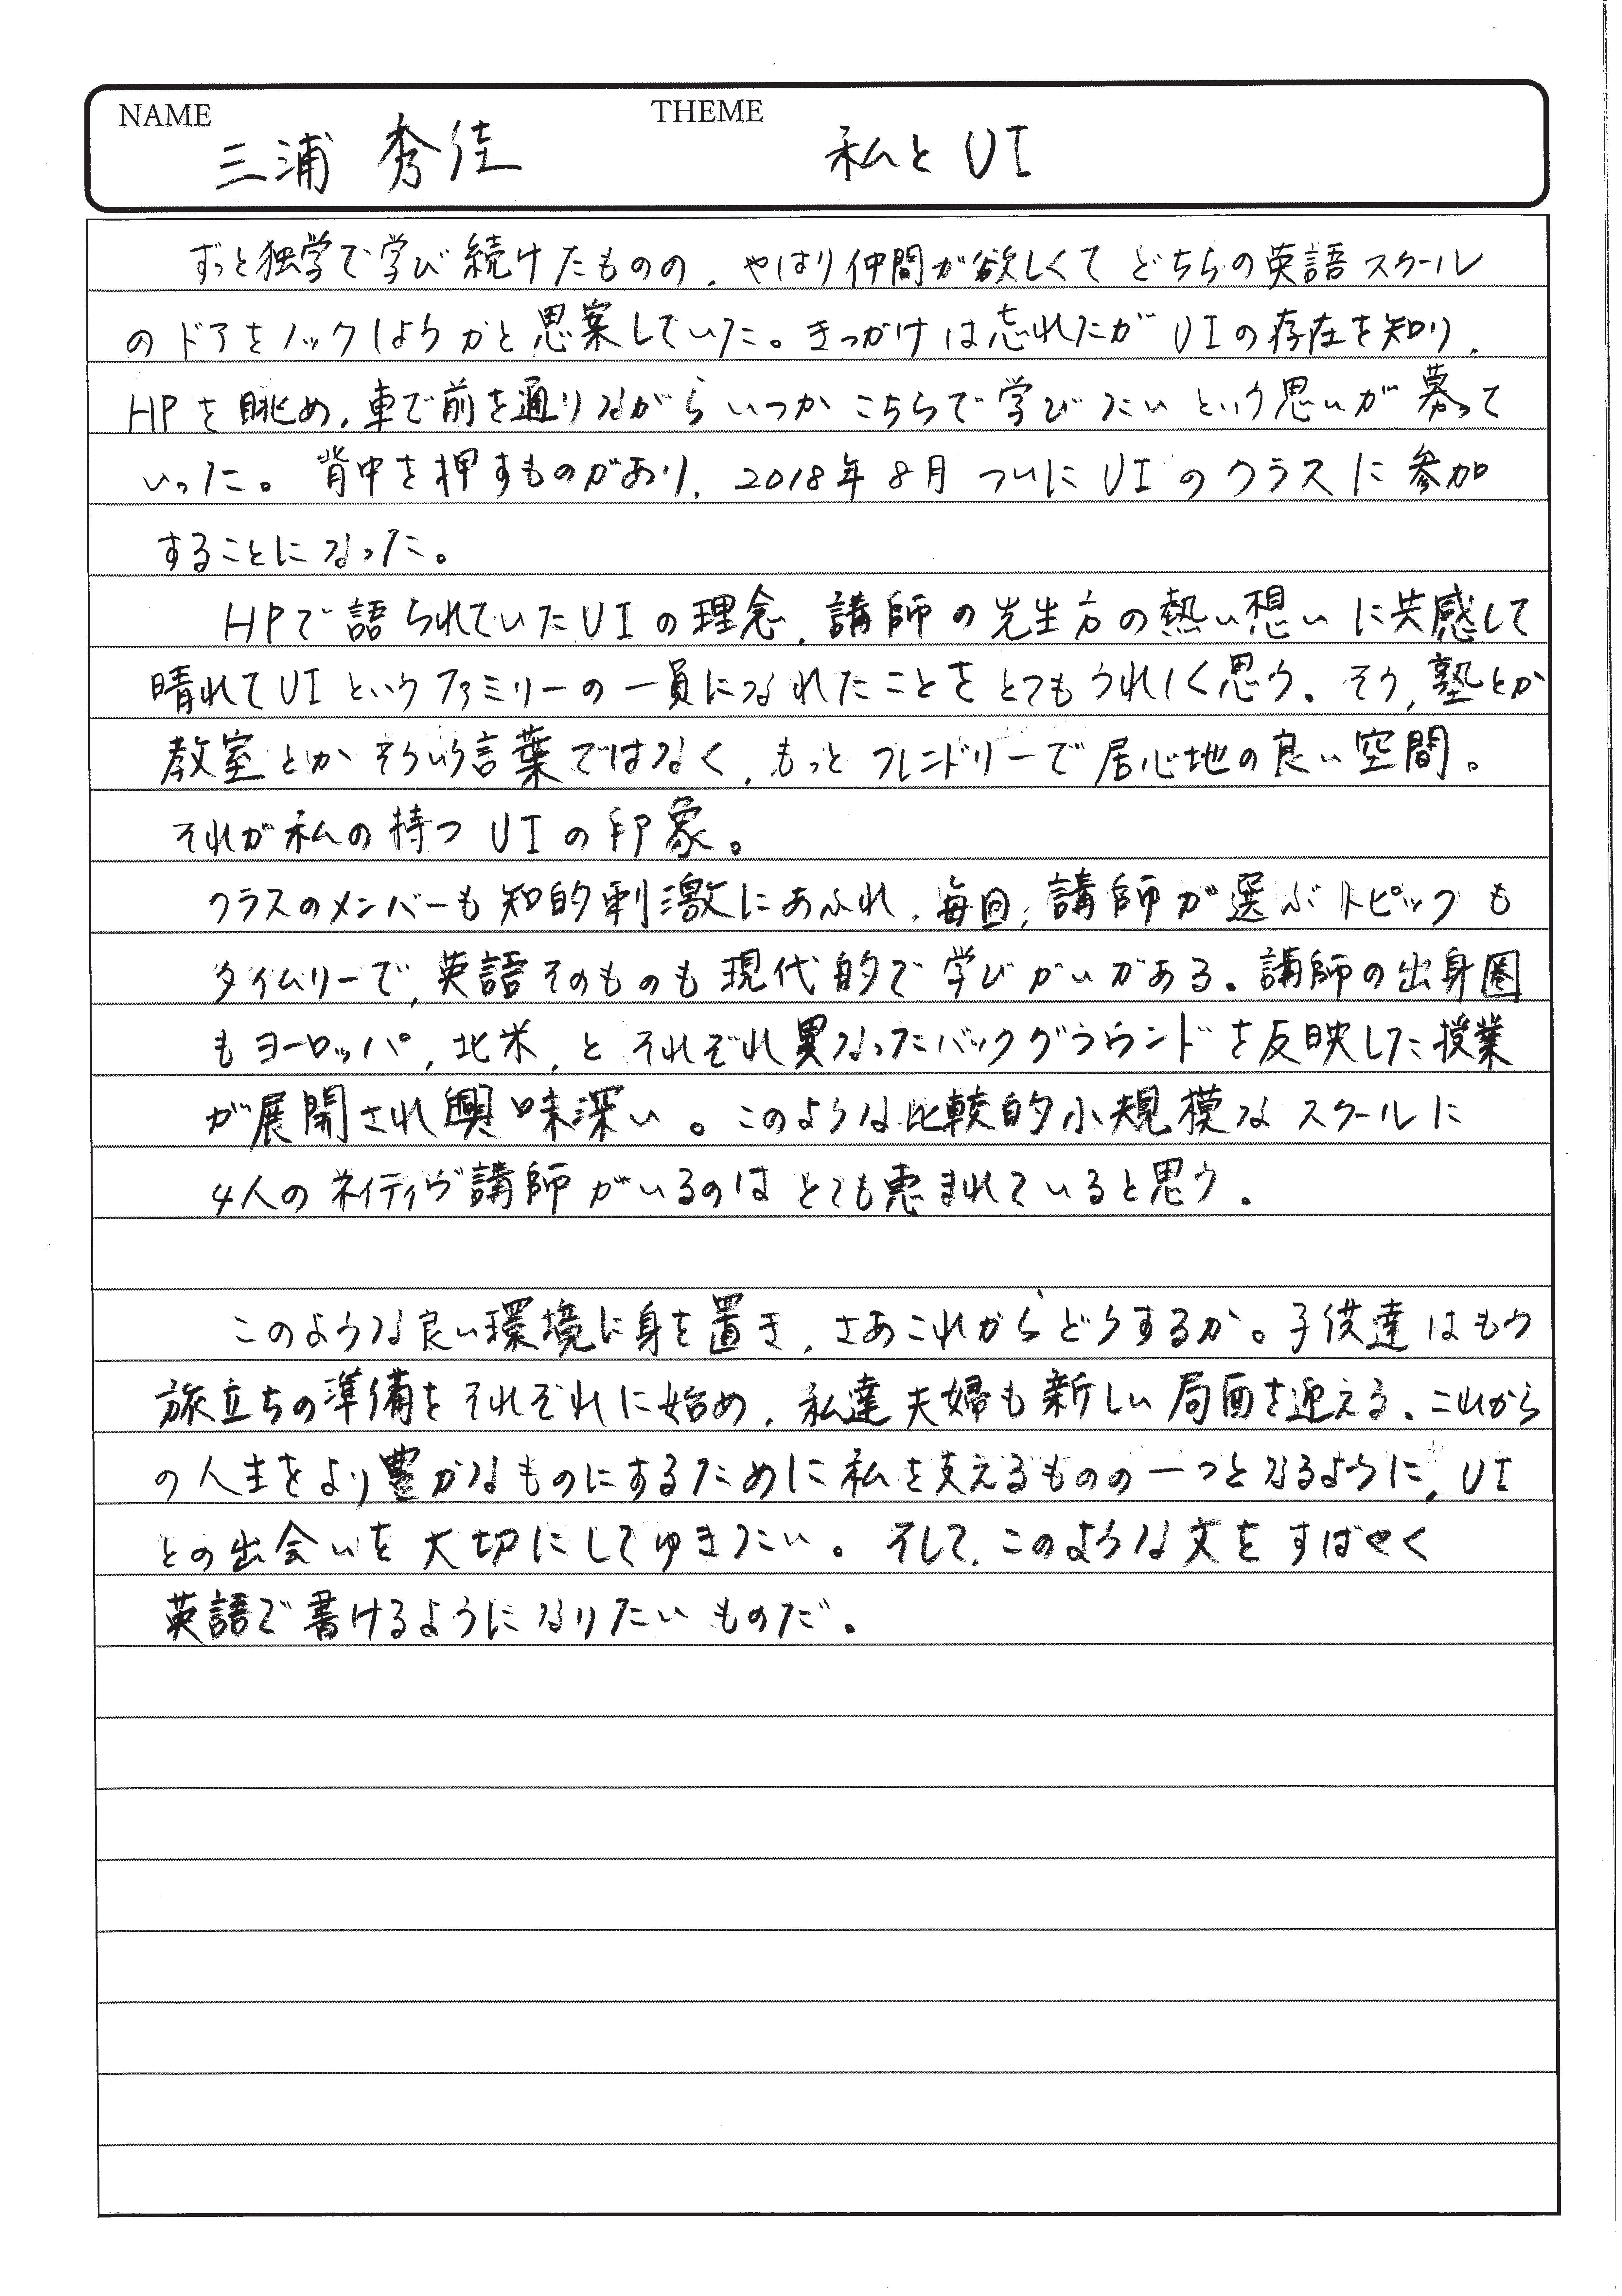 UI School 20周年記念 作文・エッセイコンテスト